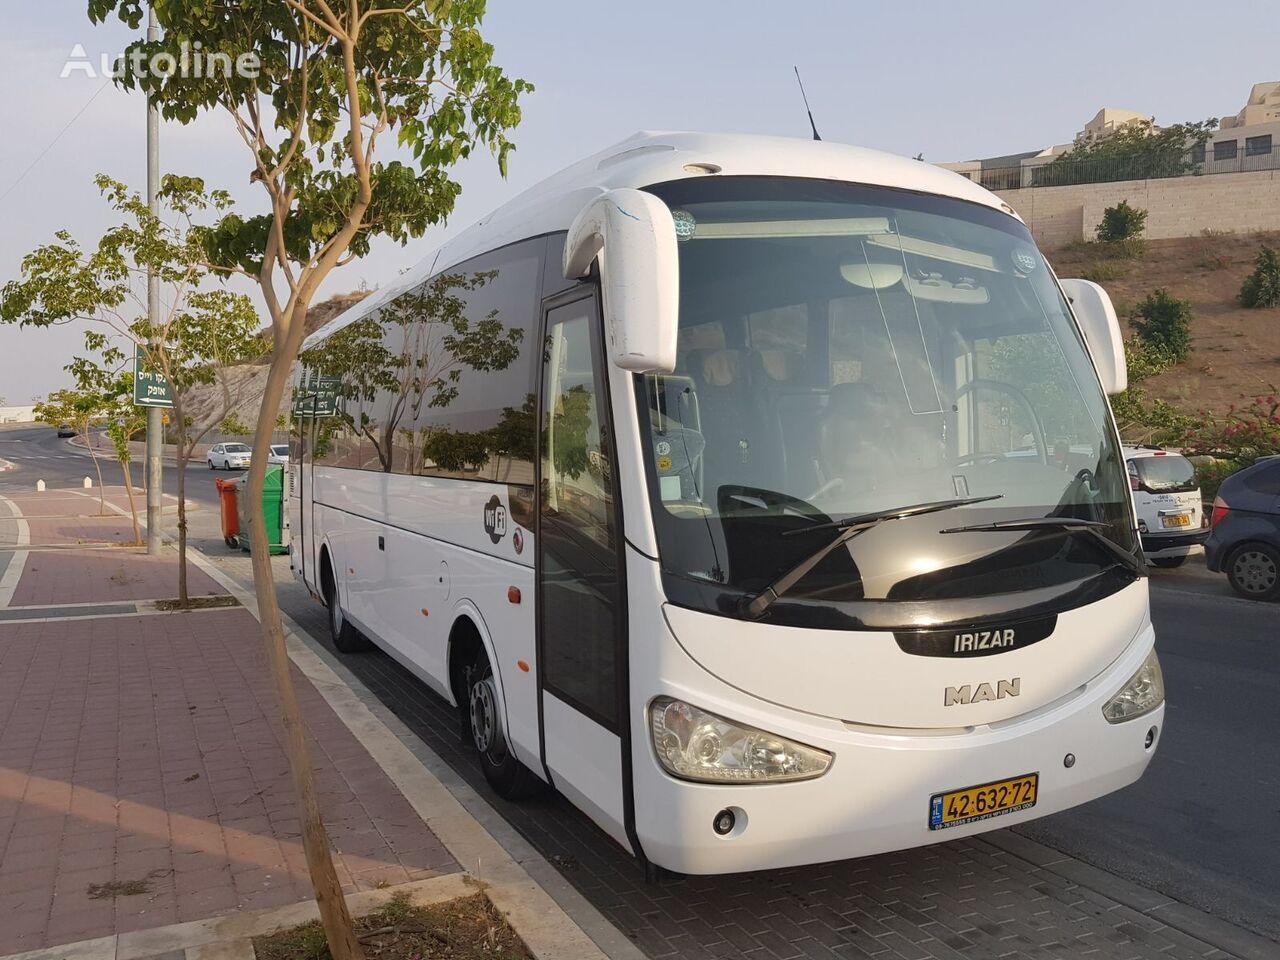 Tour Bus For Sale >> Romanya Dan Satilik Man Irizar 5 Buses For Sale Tur Otobusleri Tur